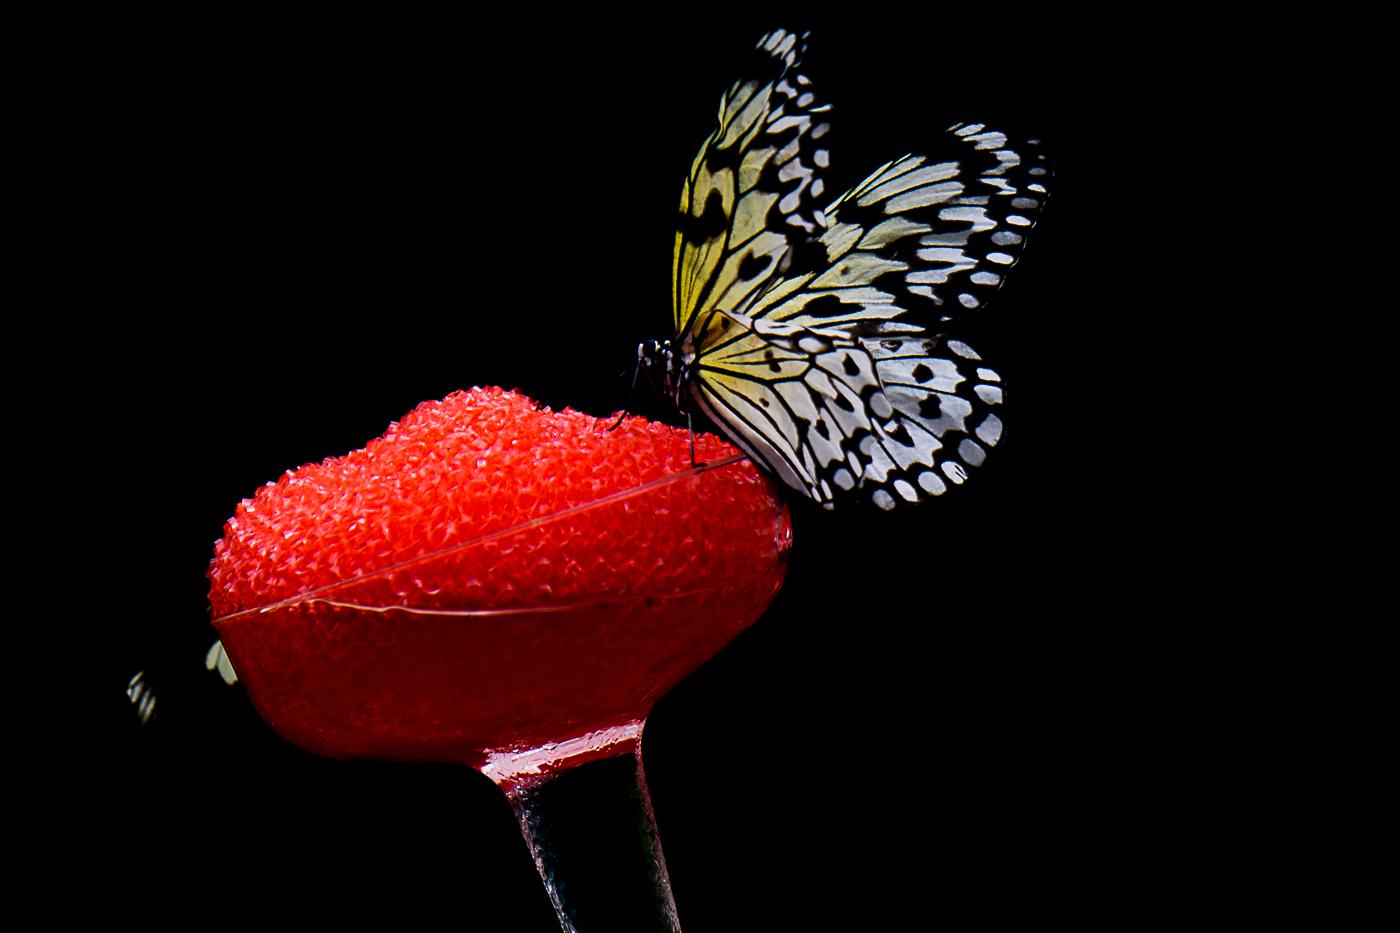 Red Nectar (c) William Feiring